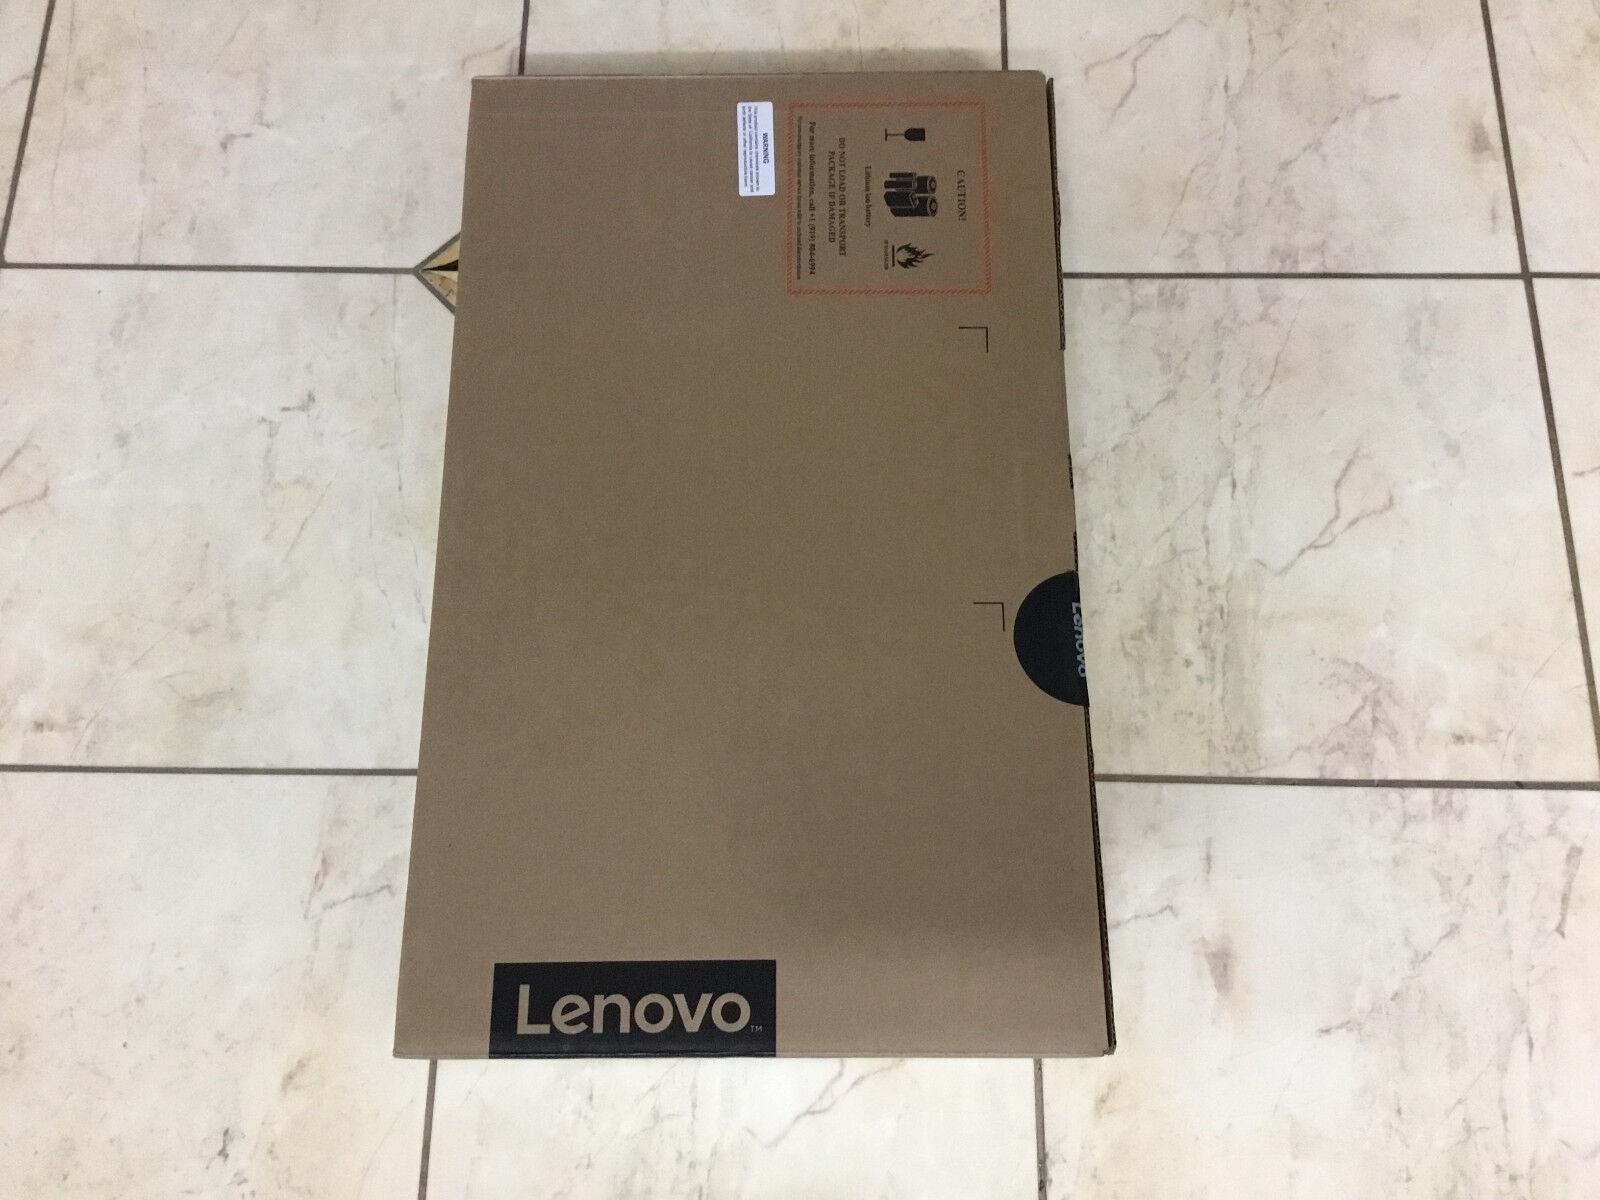 Купить Lenovo - Lenovo Ideapad 510 - 15.6 FHD Laptop (Intel Core i5 8 GB RAM 1TB HDD .BRAND NEW